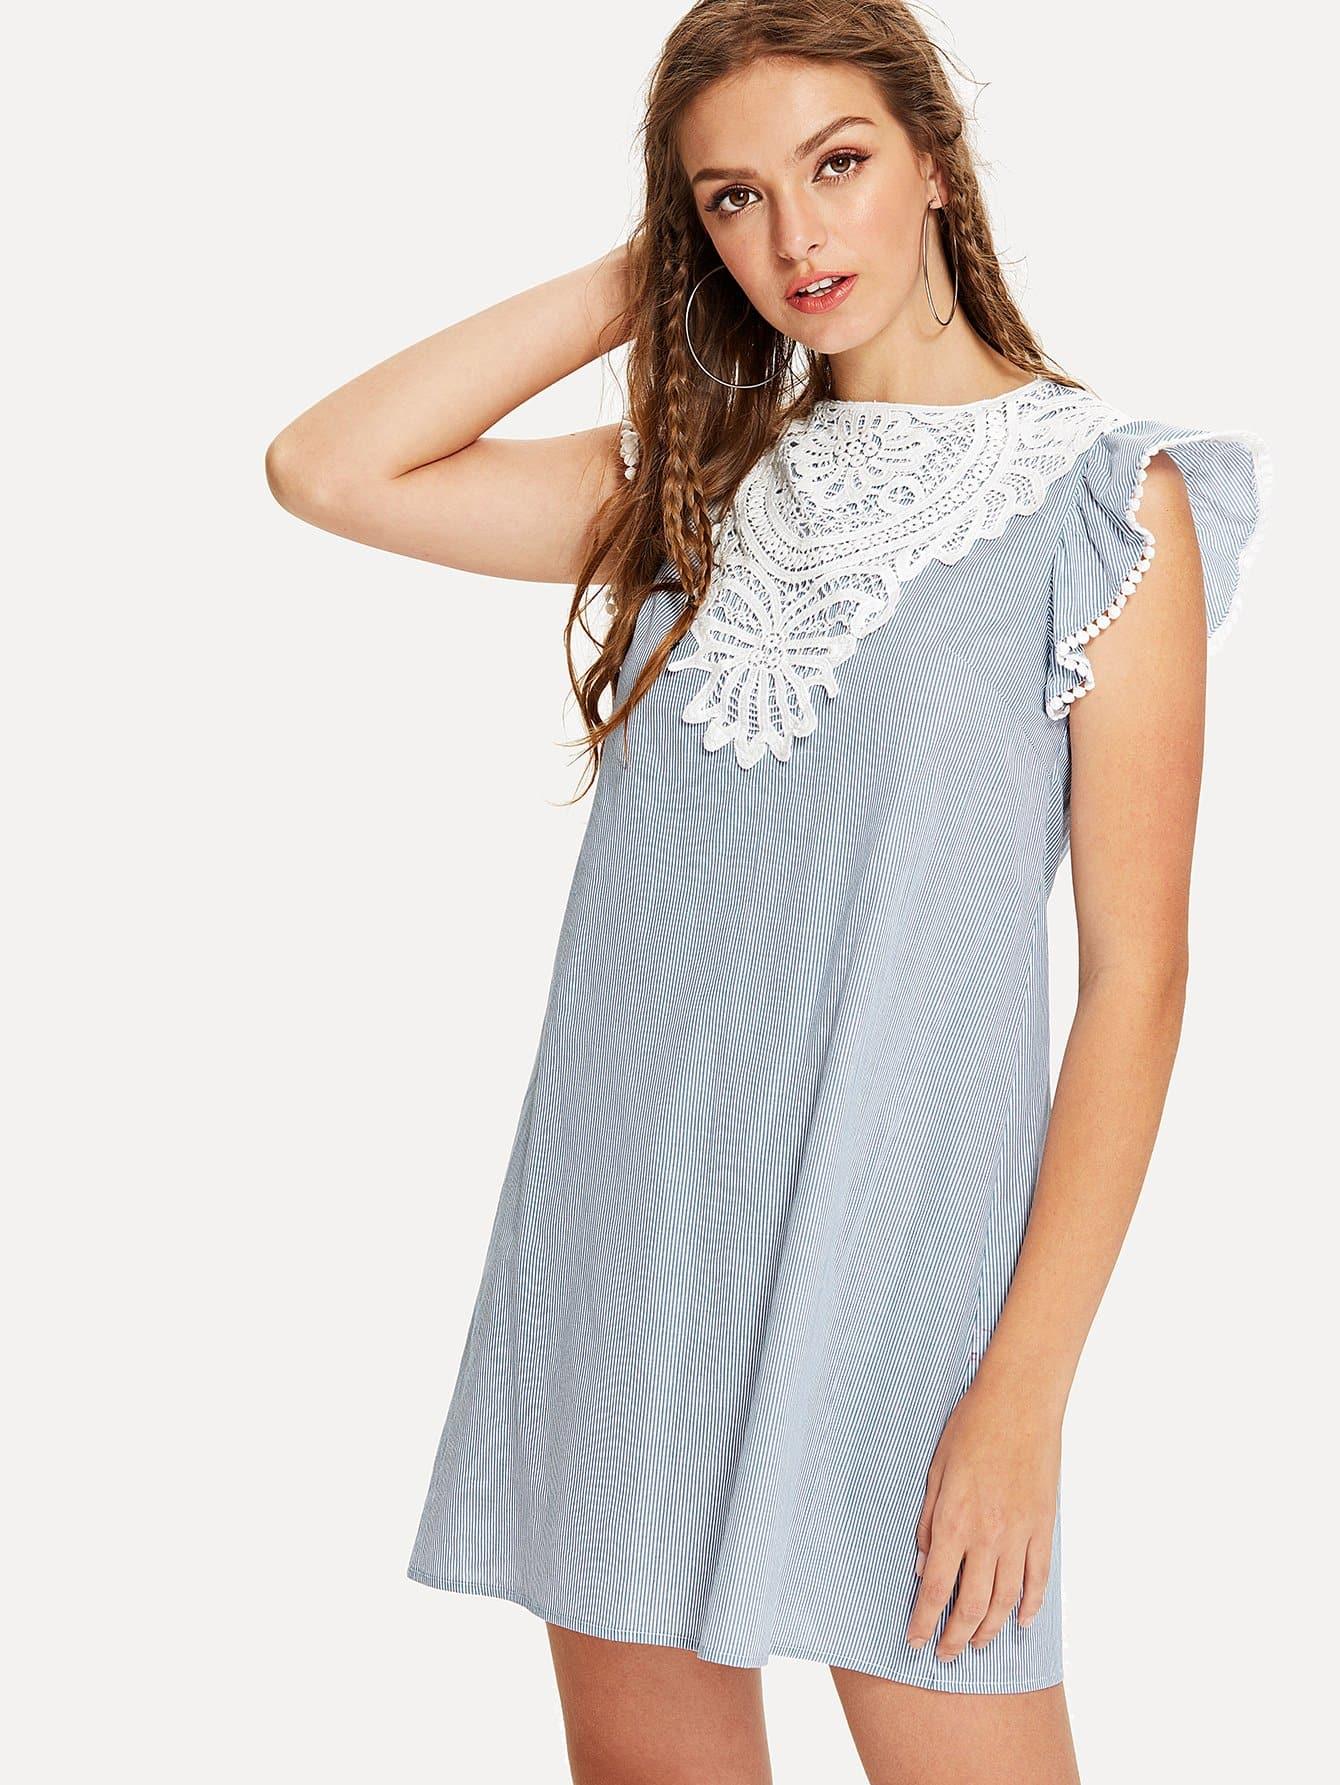 Contrast Lace Applique Ruffle Pinstripe Dress contrast collar lace applique pleated pinstripe dress